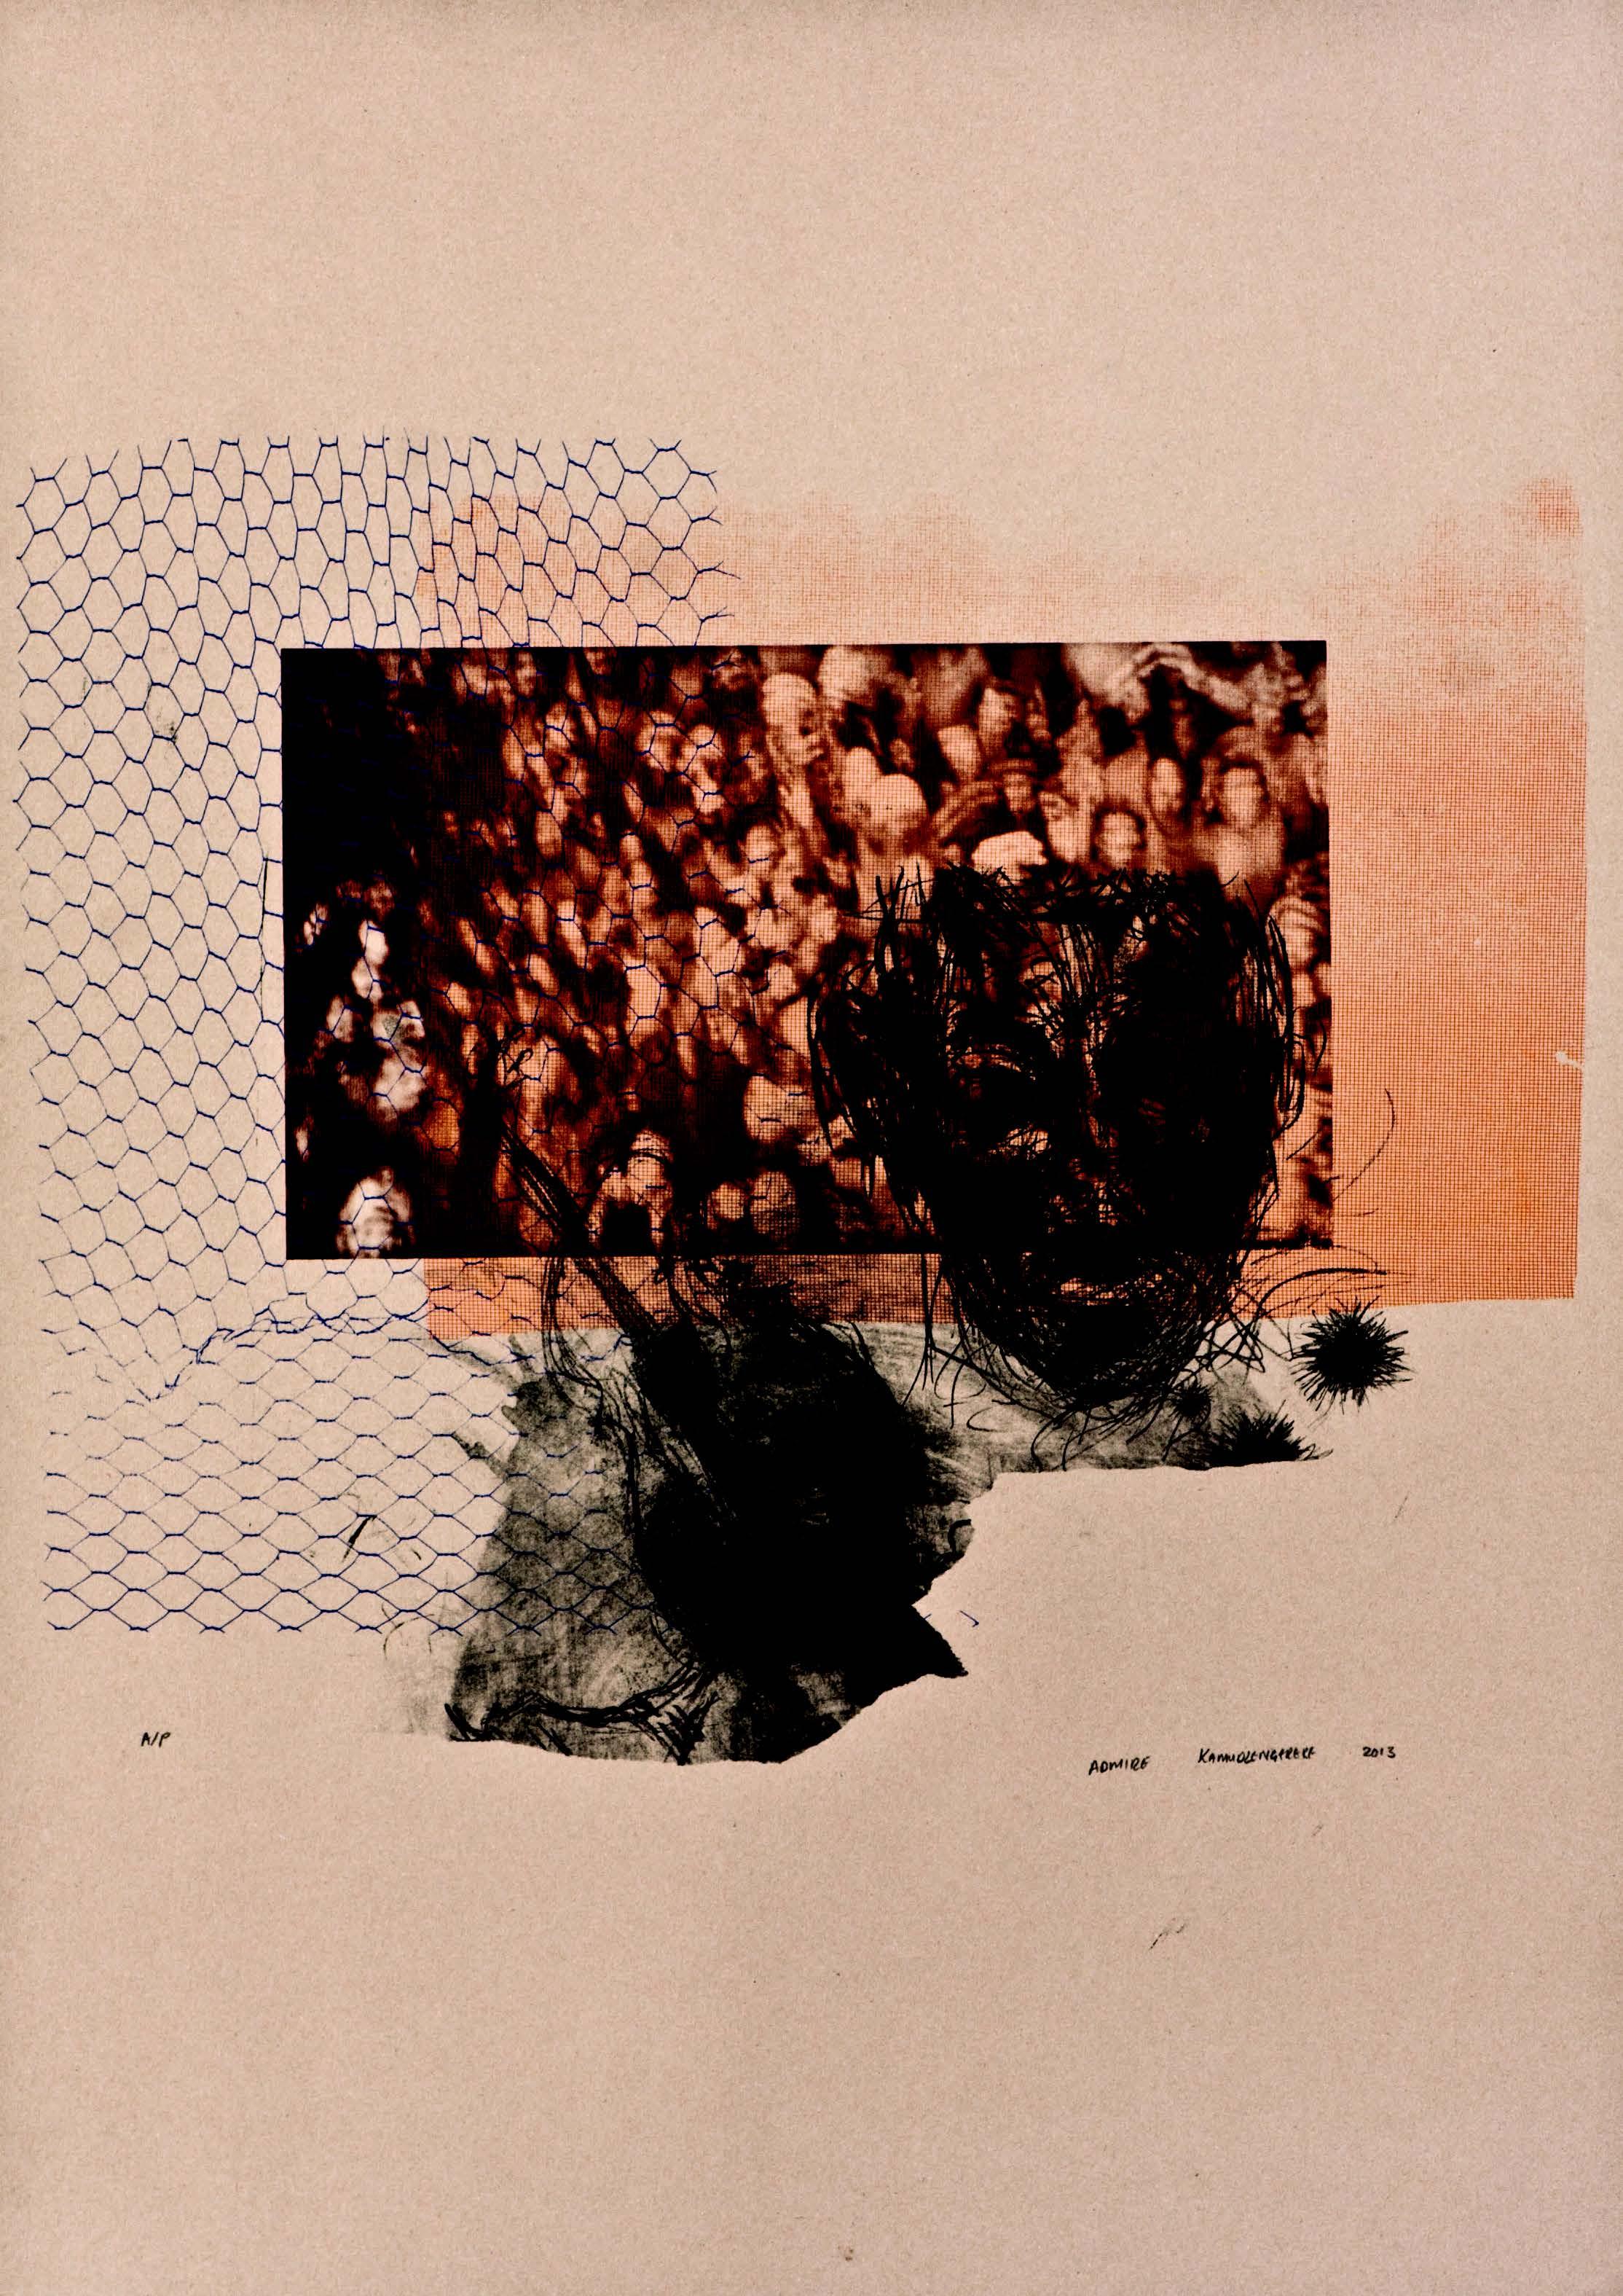 Admire Kamudzengerere, Performance, 2013, Screenprint 90 x 64cms